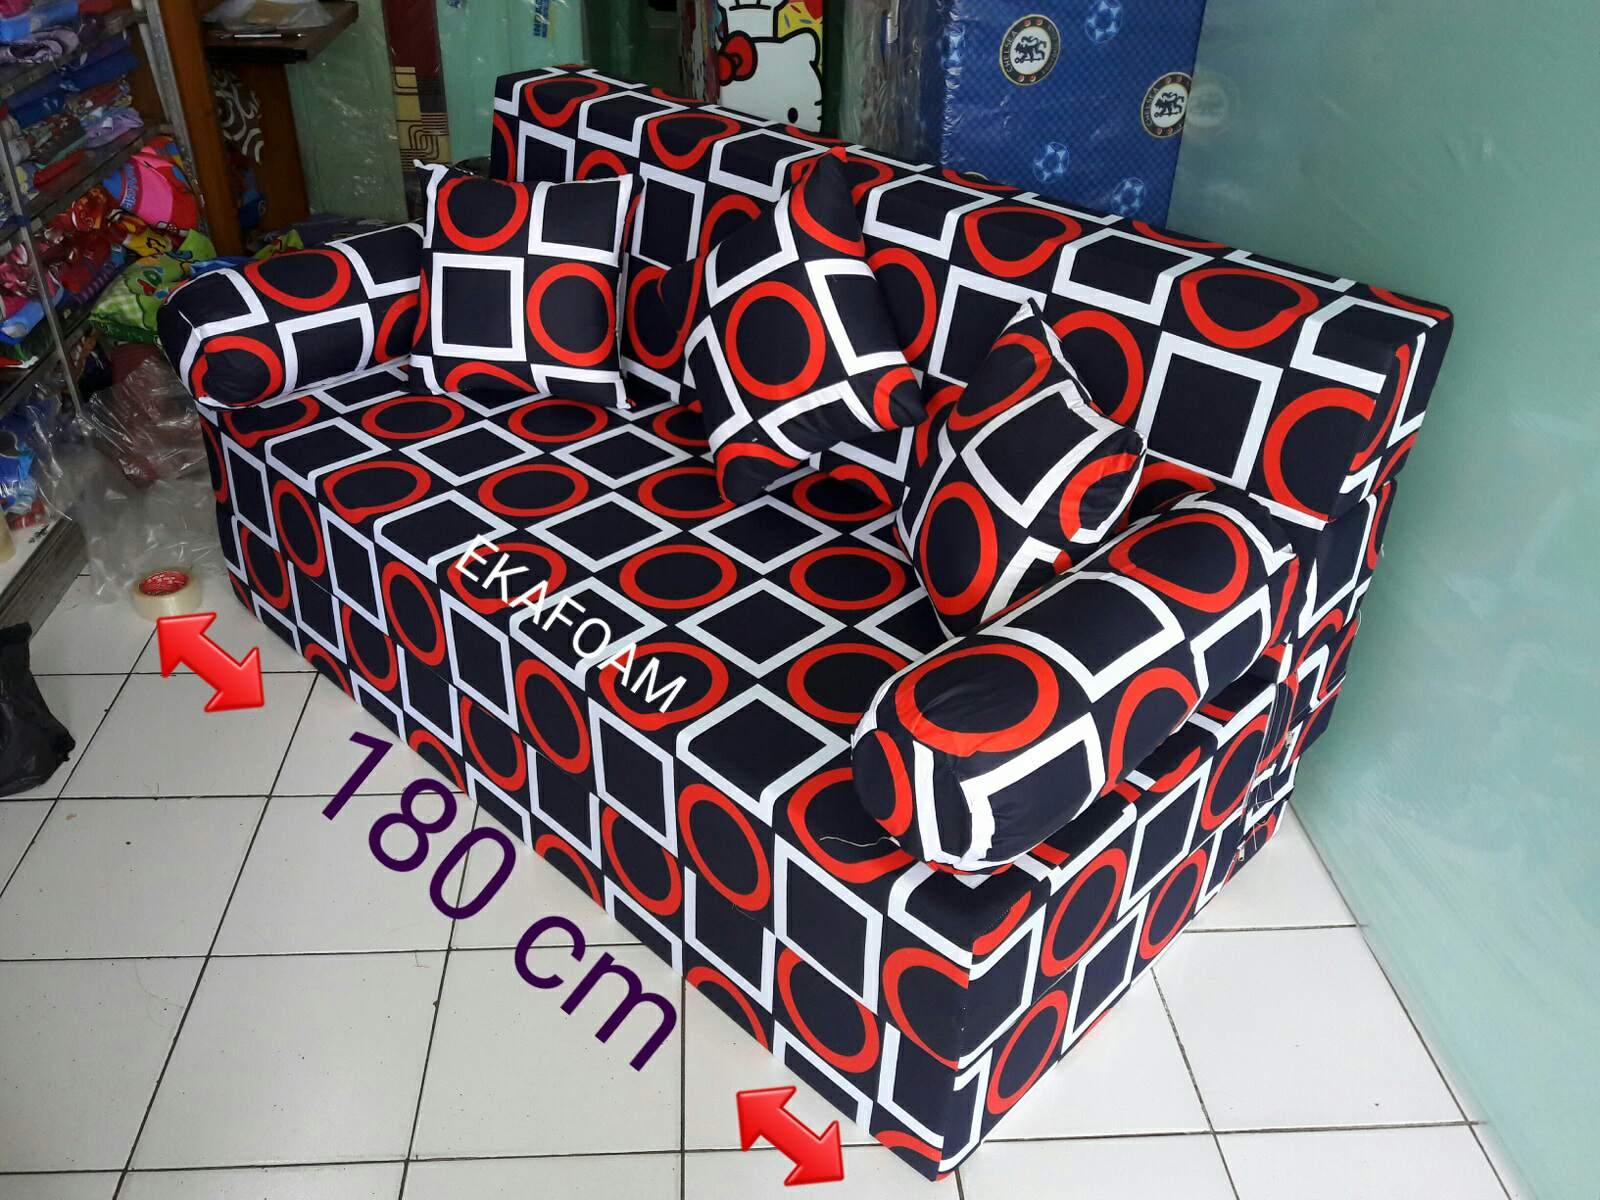 Harga Sofa Bed Inoac No 1 Canape Ken Sofactory Kasur Terbaru Mei 2018 Agen Busa